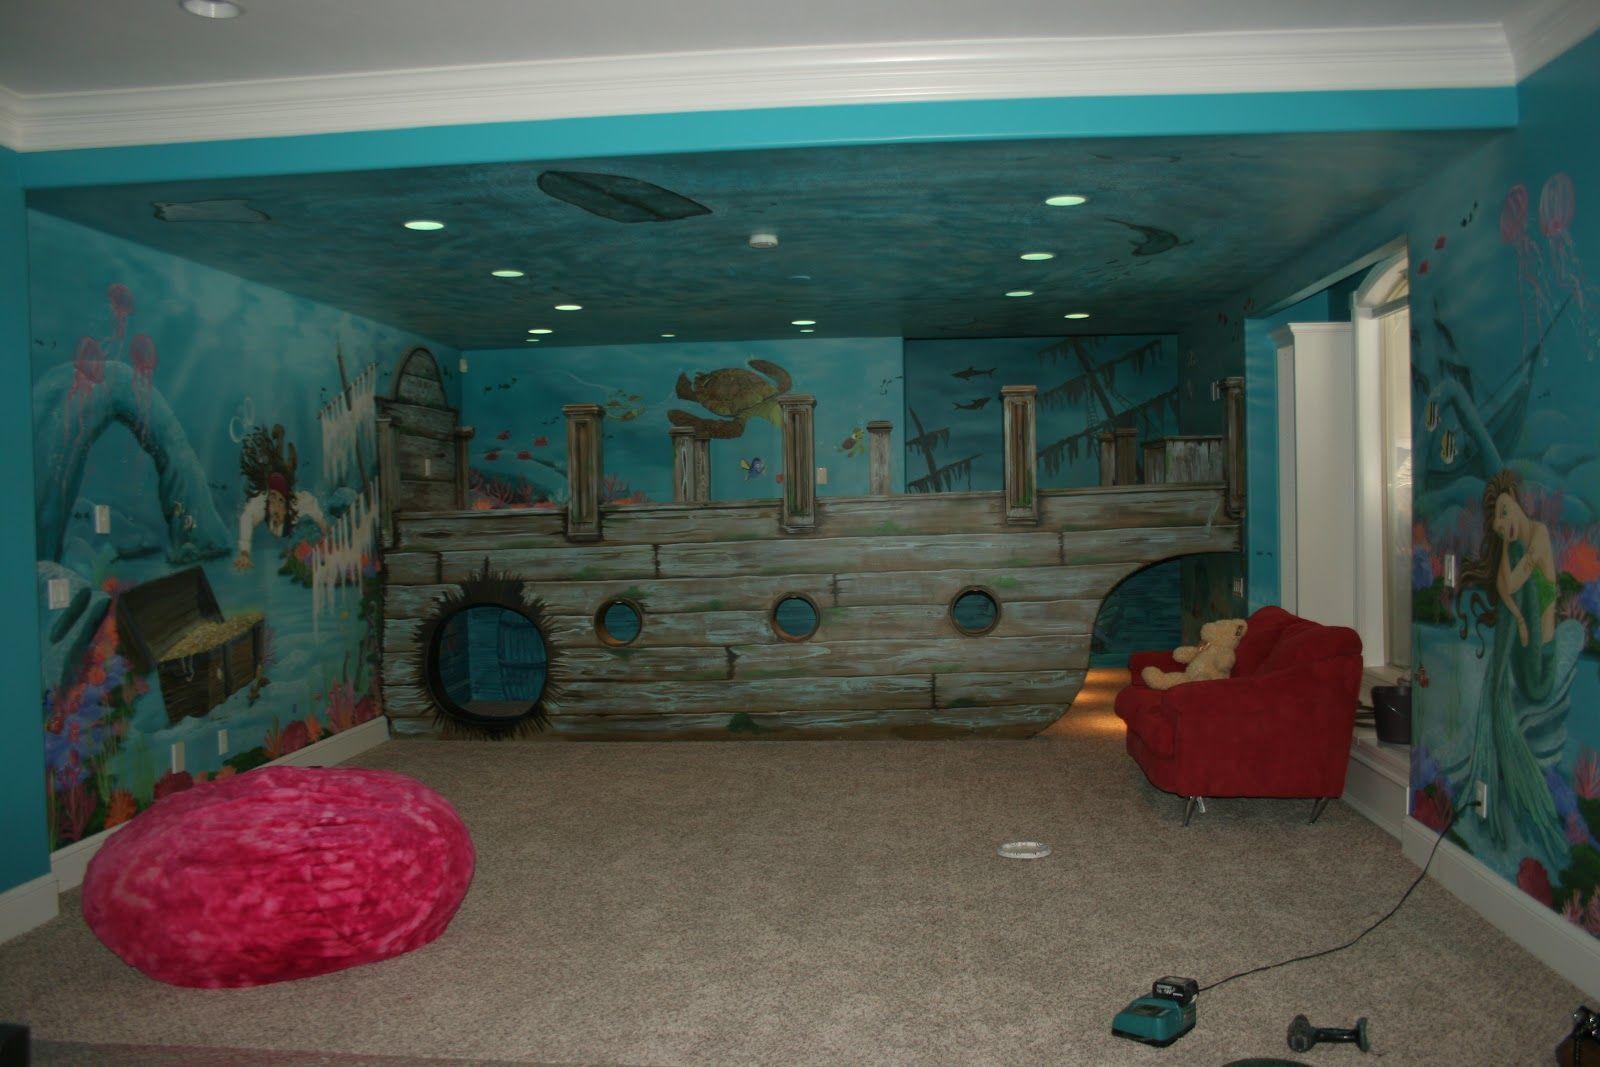 artistic murals sunken ship pirate underwater mural home artistic murals sunken ship pirate underwater mural